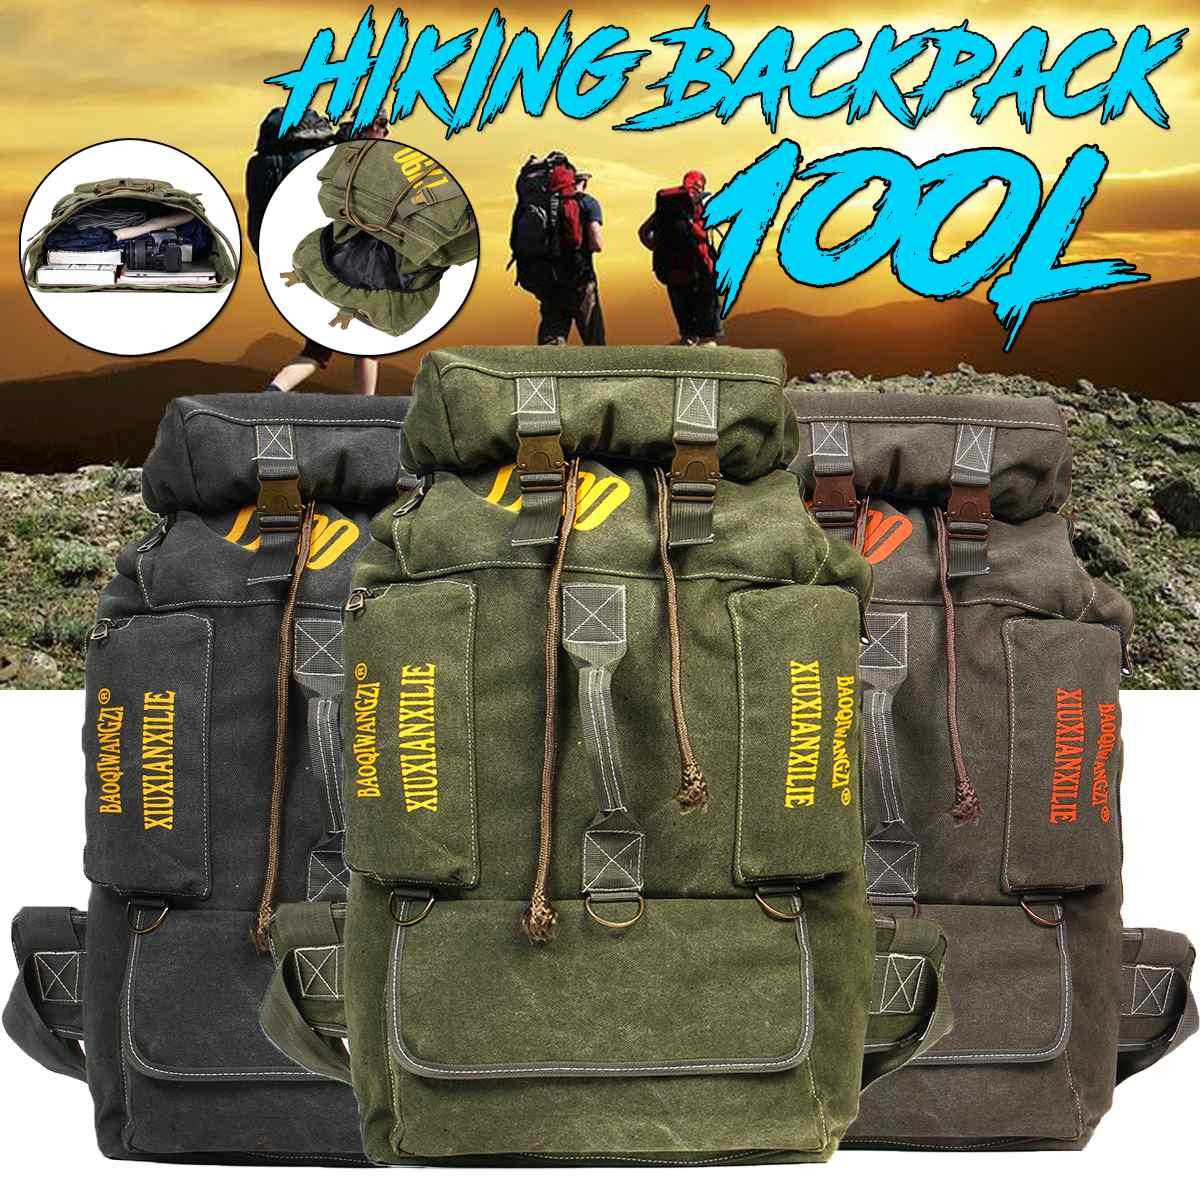 60/90/100L WaterProof Oxford Travel Bag Large Capacity Journey Backpack Outdoor Camping Sports Bag Climbing Hiking Backpacks Bag